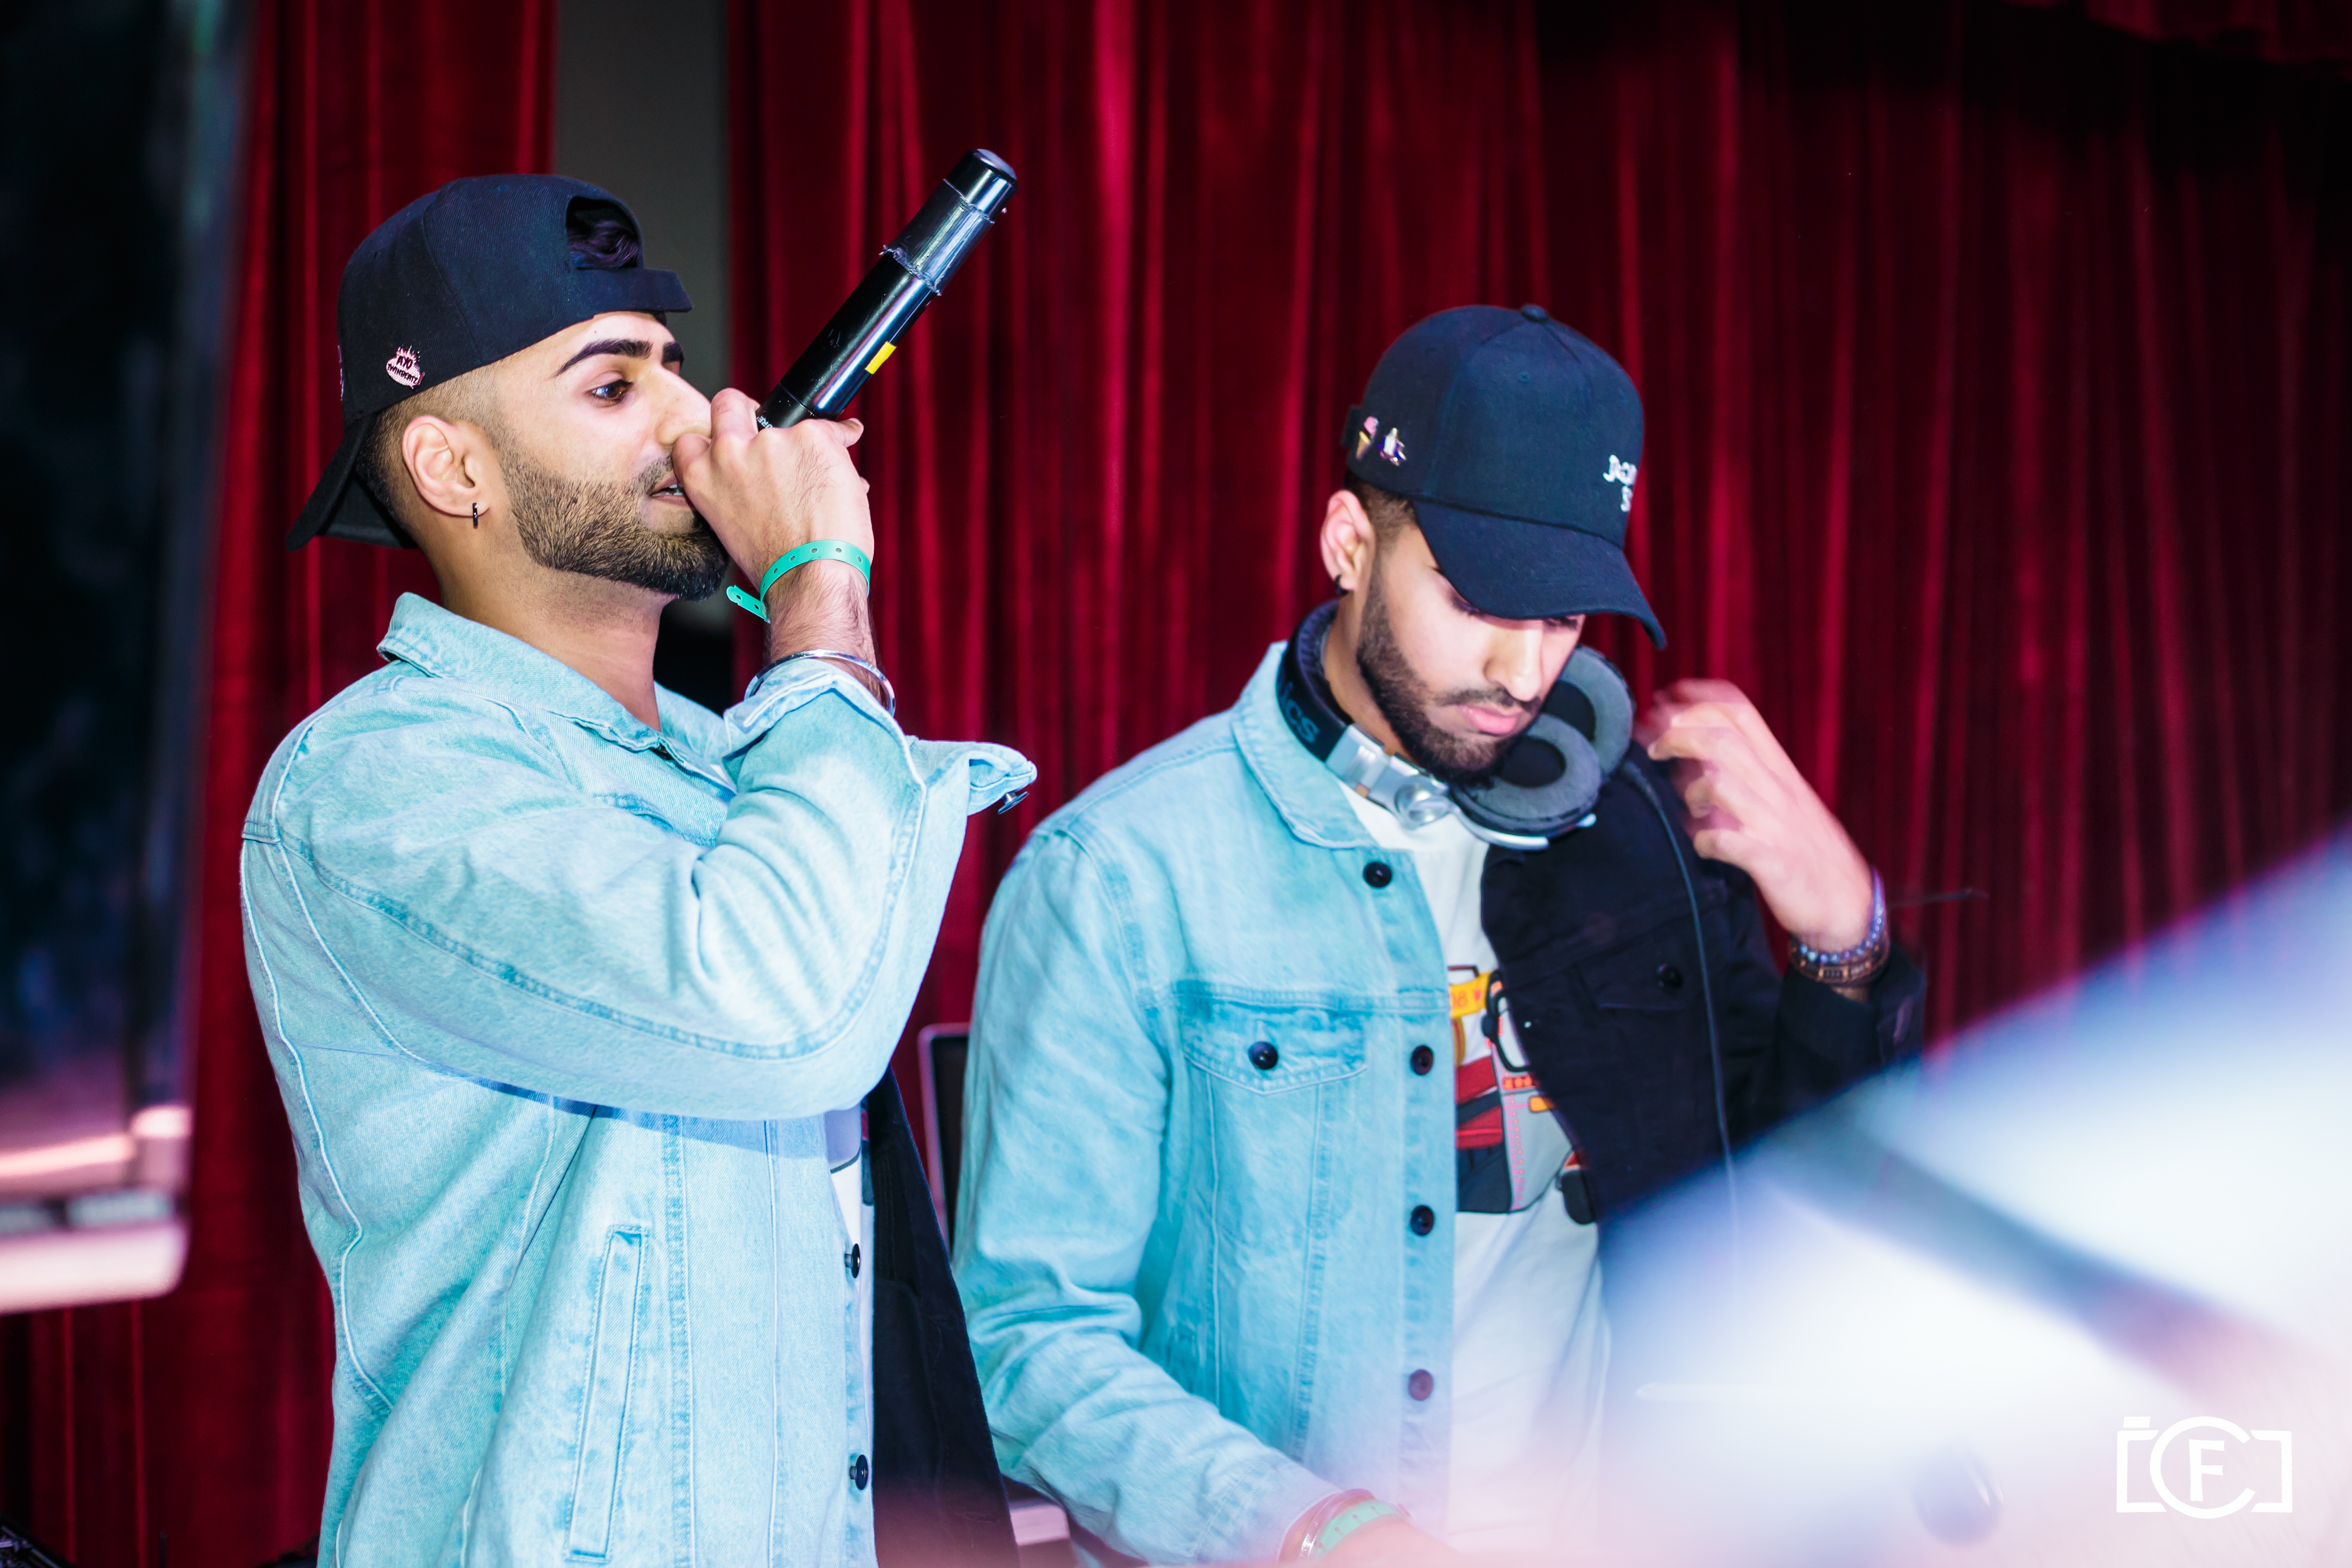 Twinbeatz Live at Rutgers 2k19